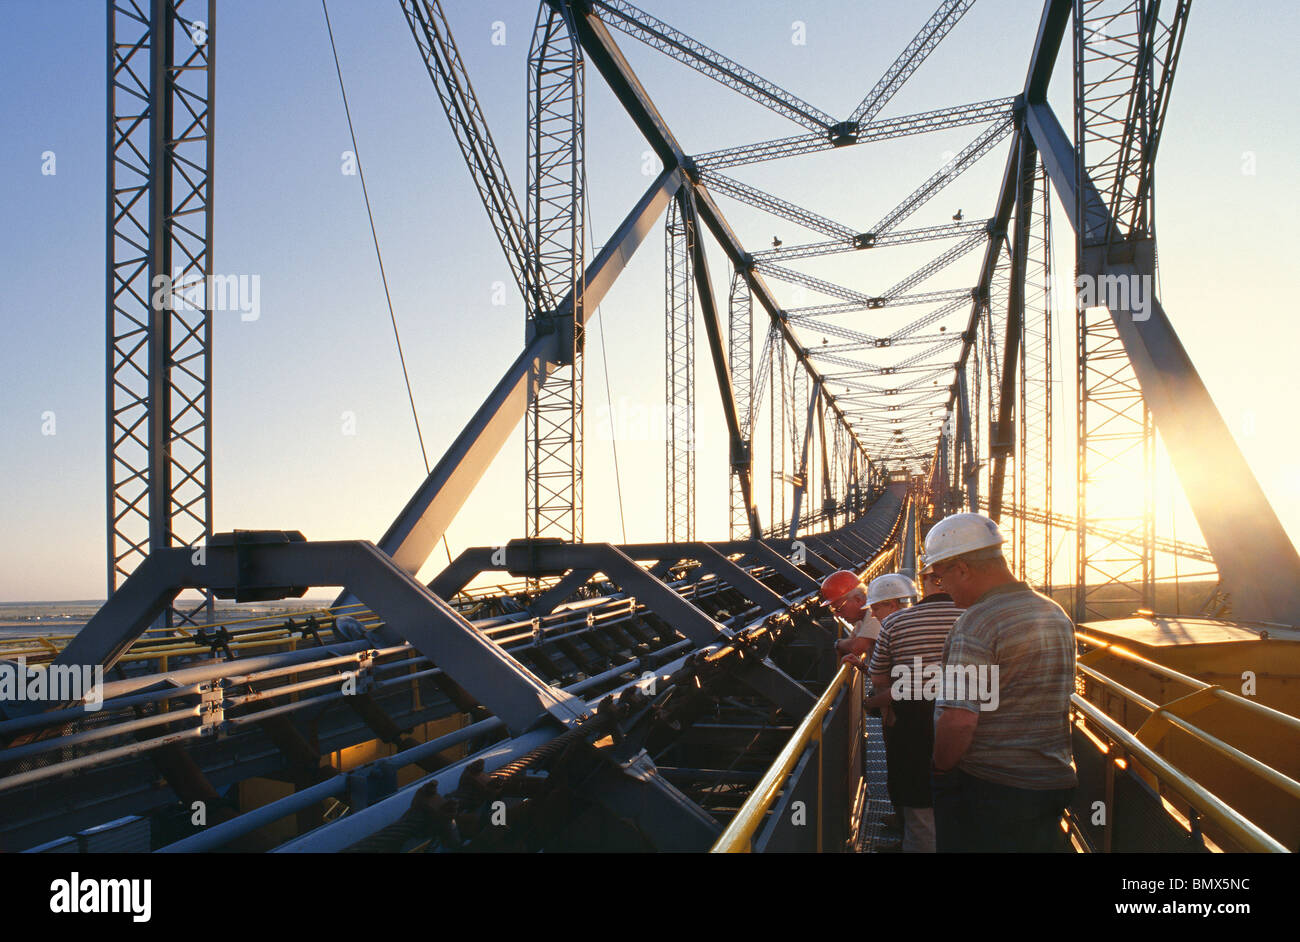 Overburden Conveyor Bridge F60 for Lignite Mining - Stock Image